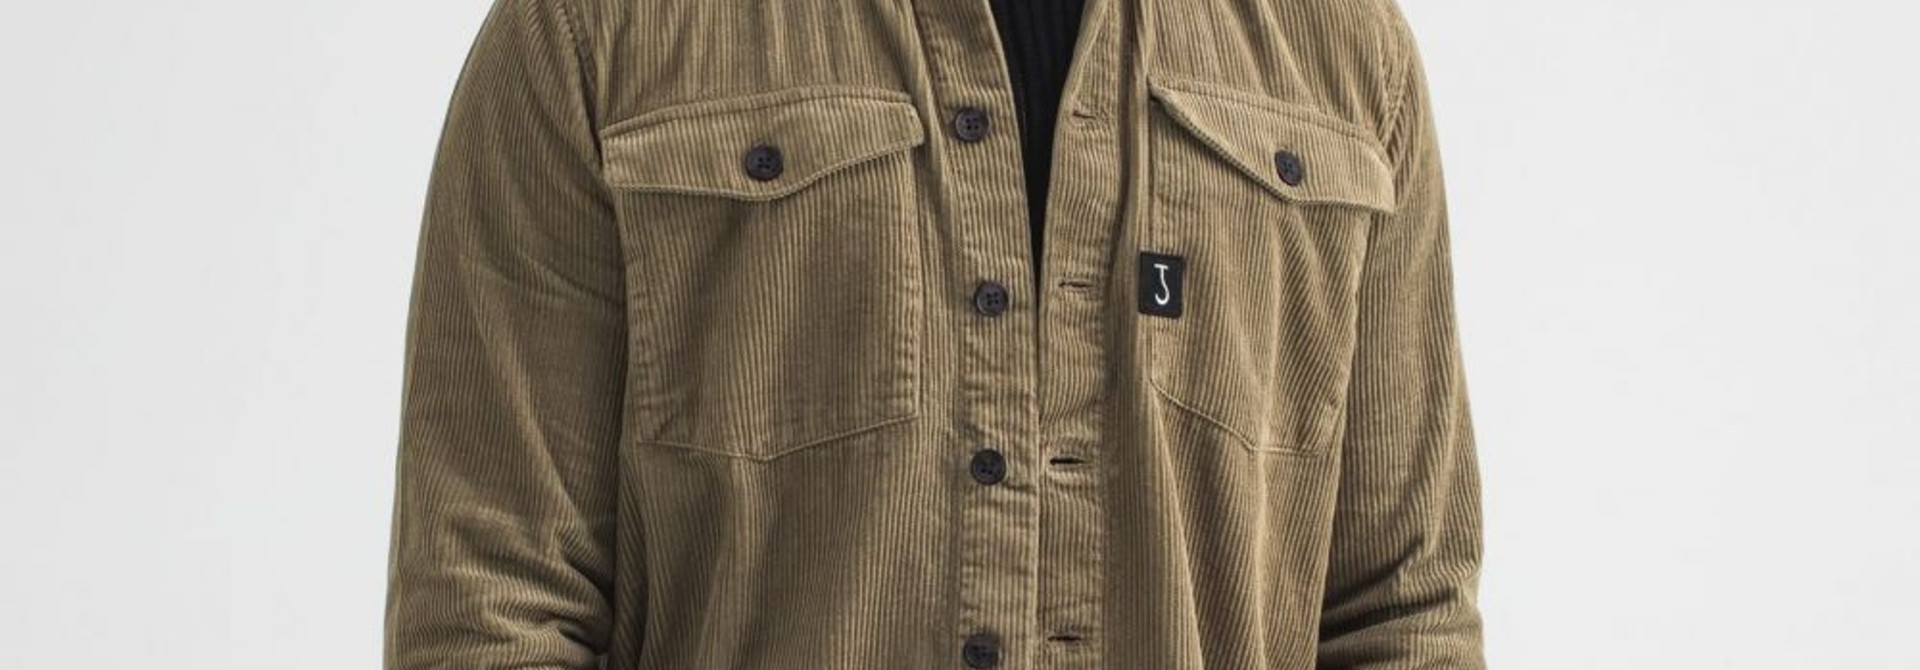 Saturn cord GD overshirt sepia brown